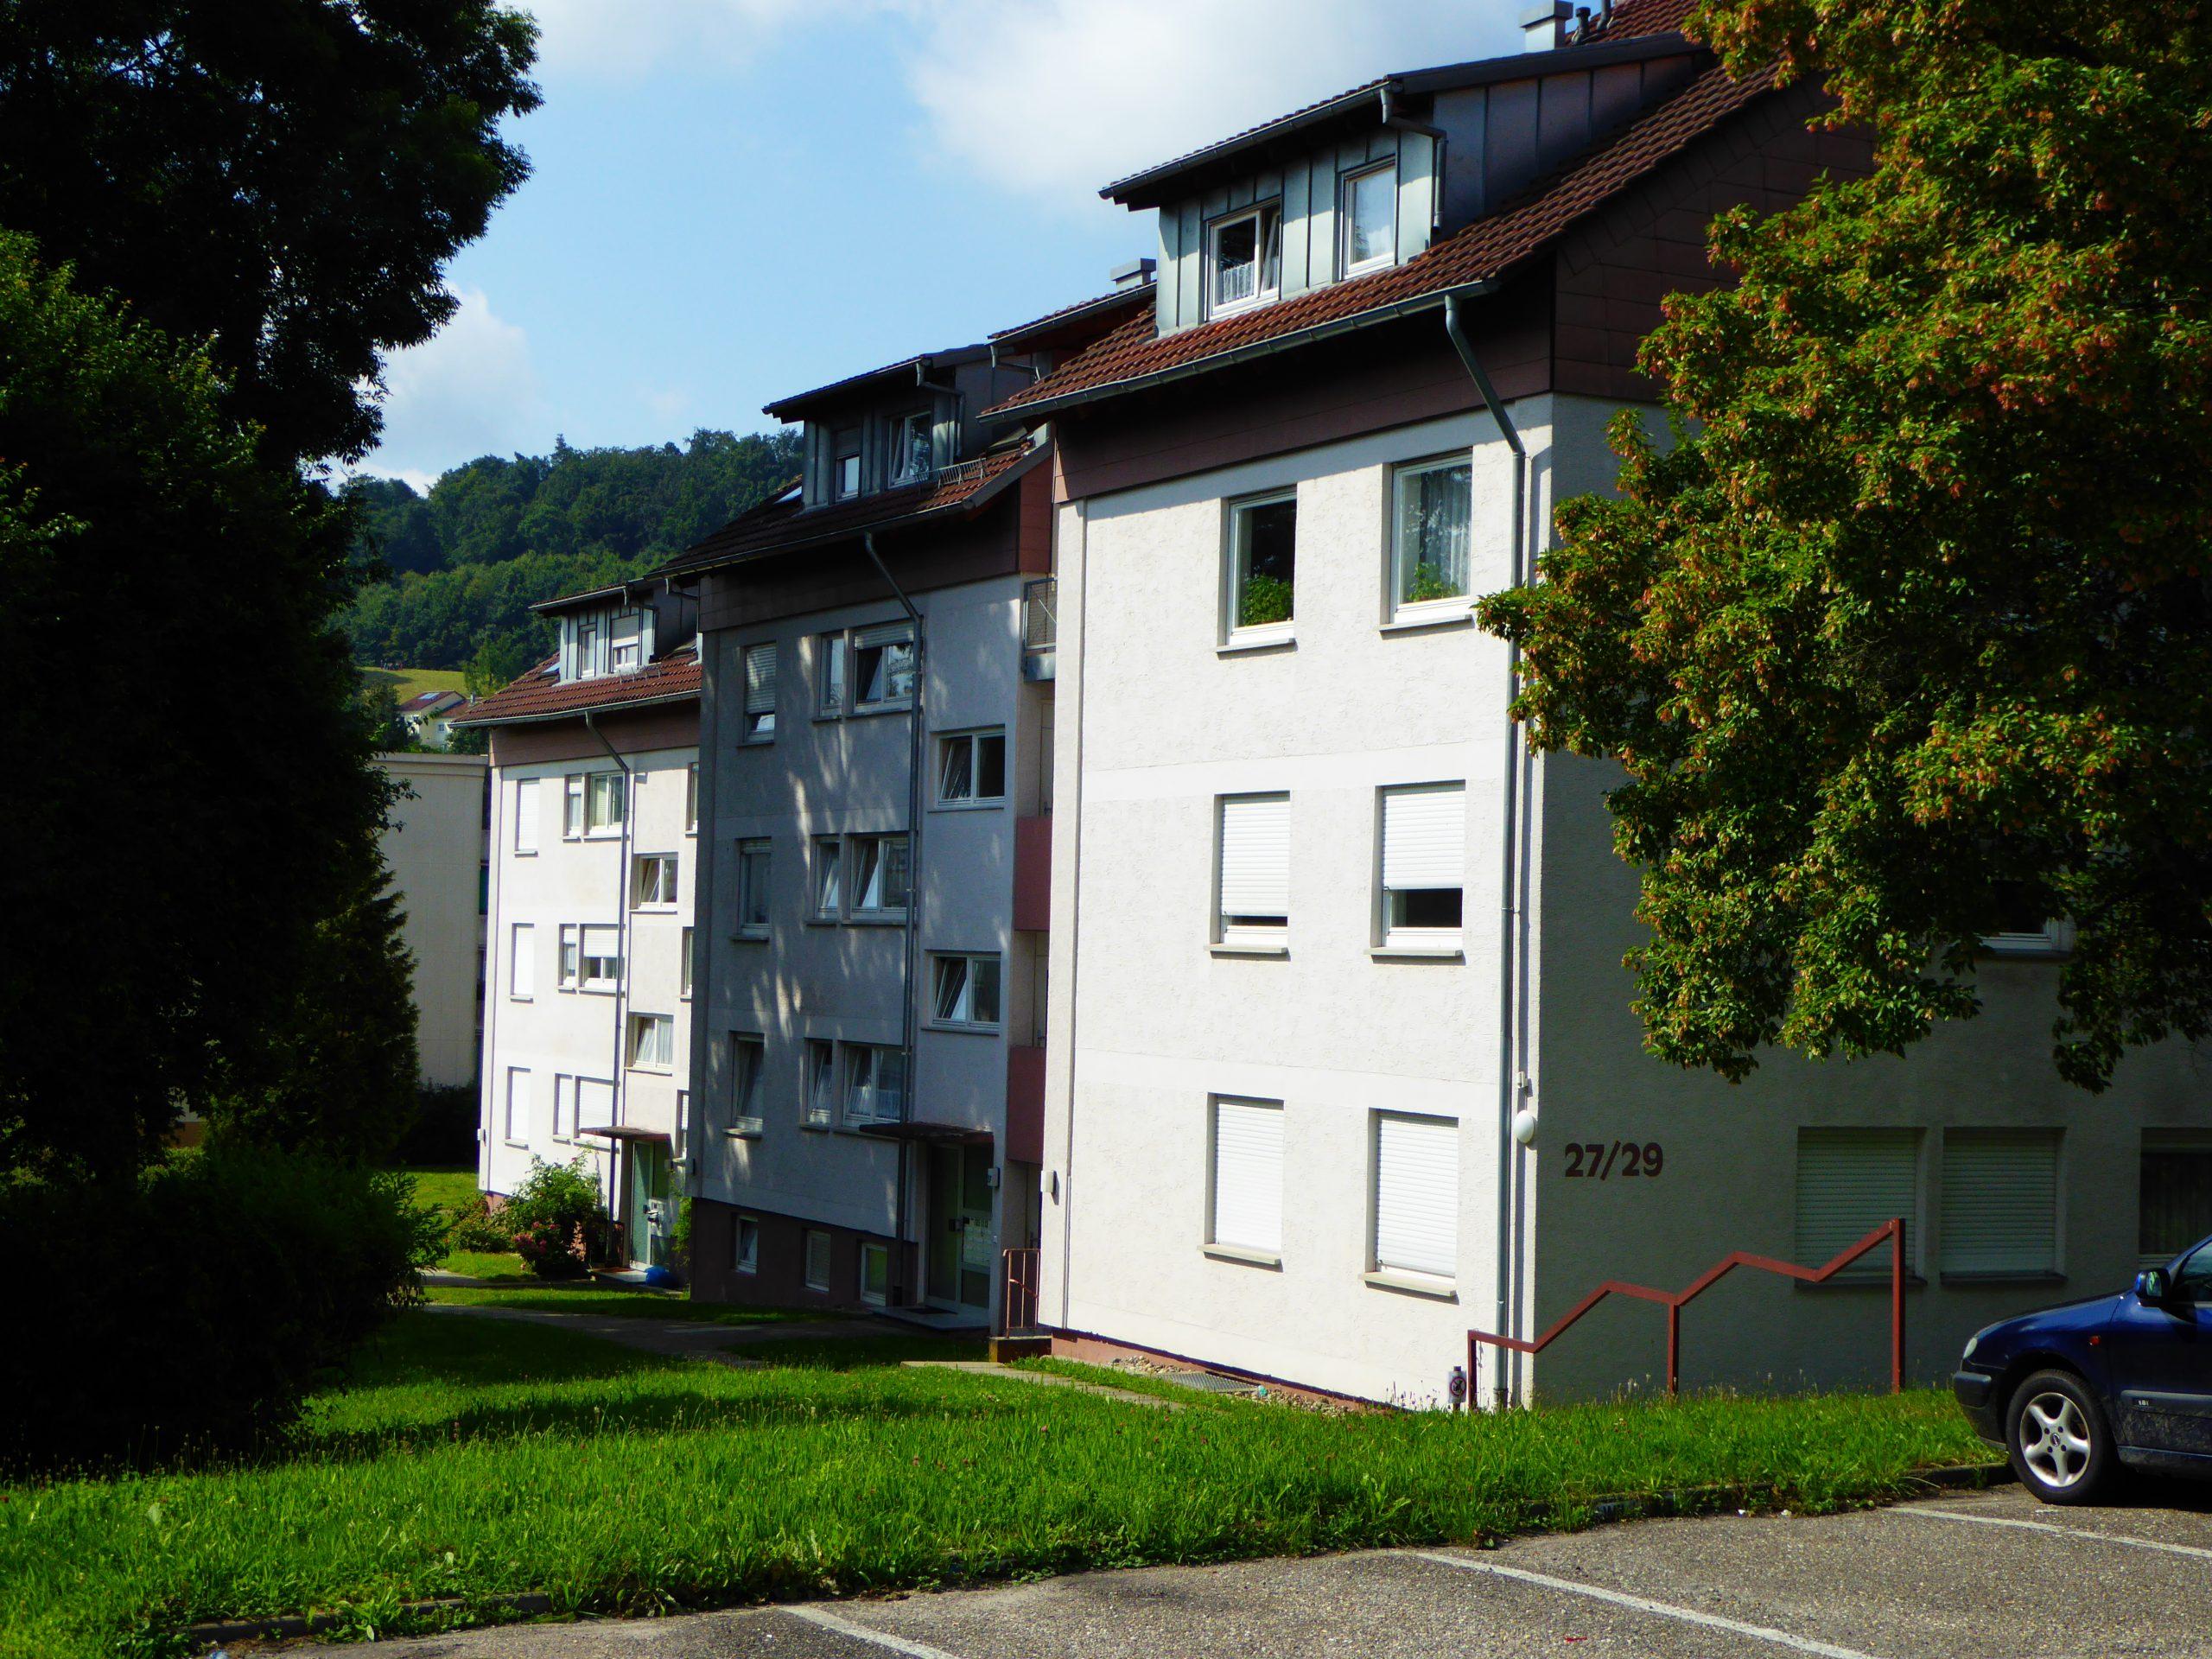 Steinhaeusle 27 29 2 scaled - Alle BGW-Häuser